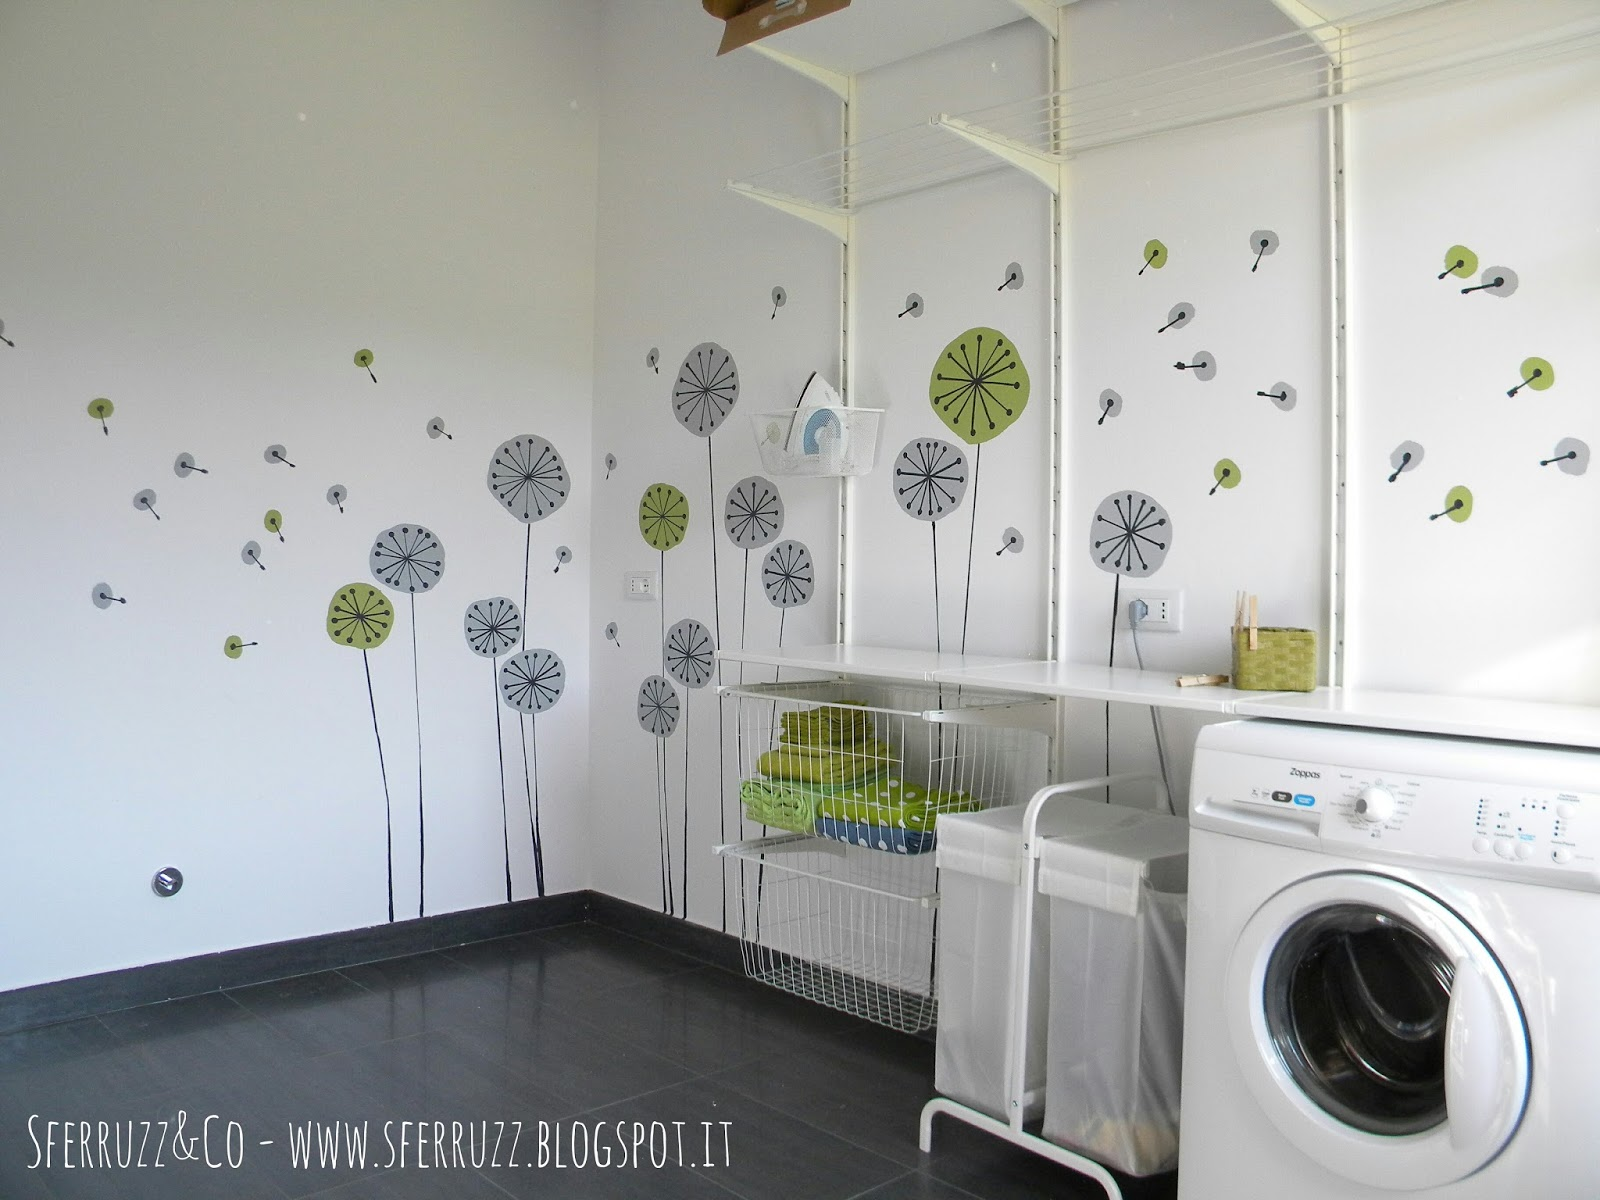 Angolo Lavanderia Ikea : Bagno ikea mobile sospeso mobile kannashoes us armadio